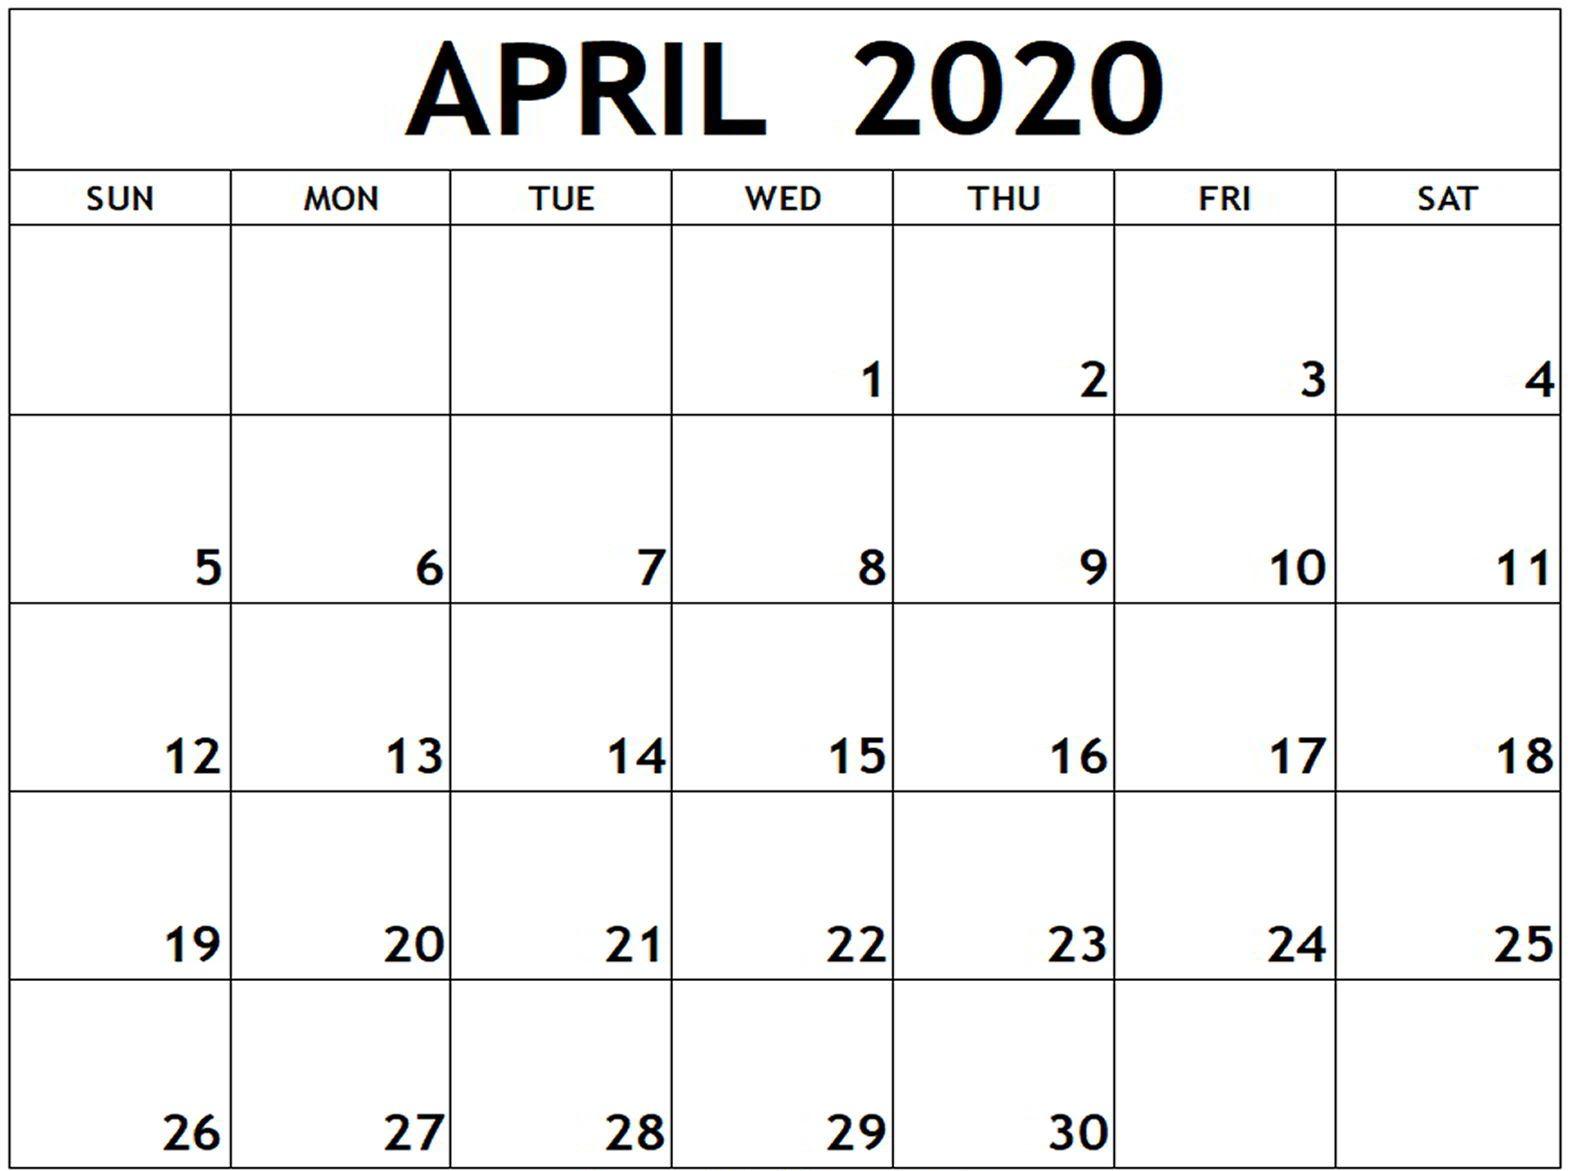 Fillable April 2020 Printable Calendar